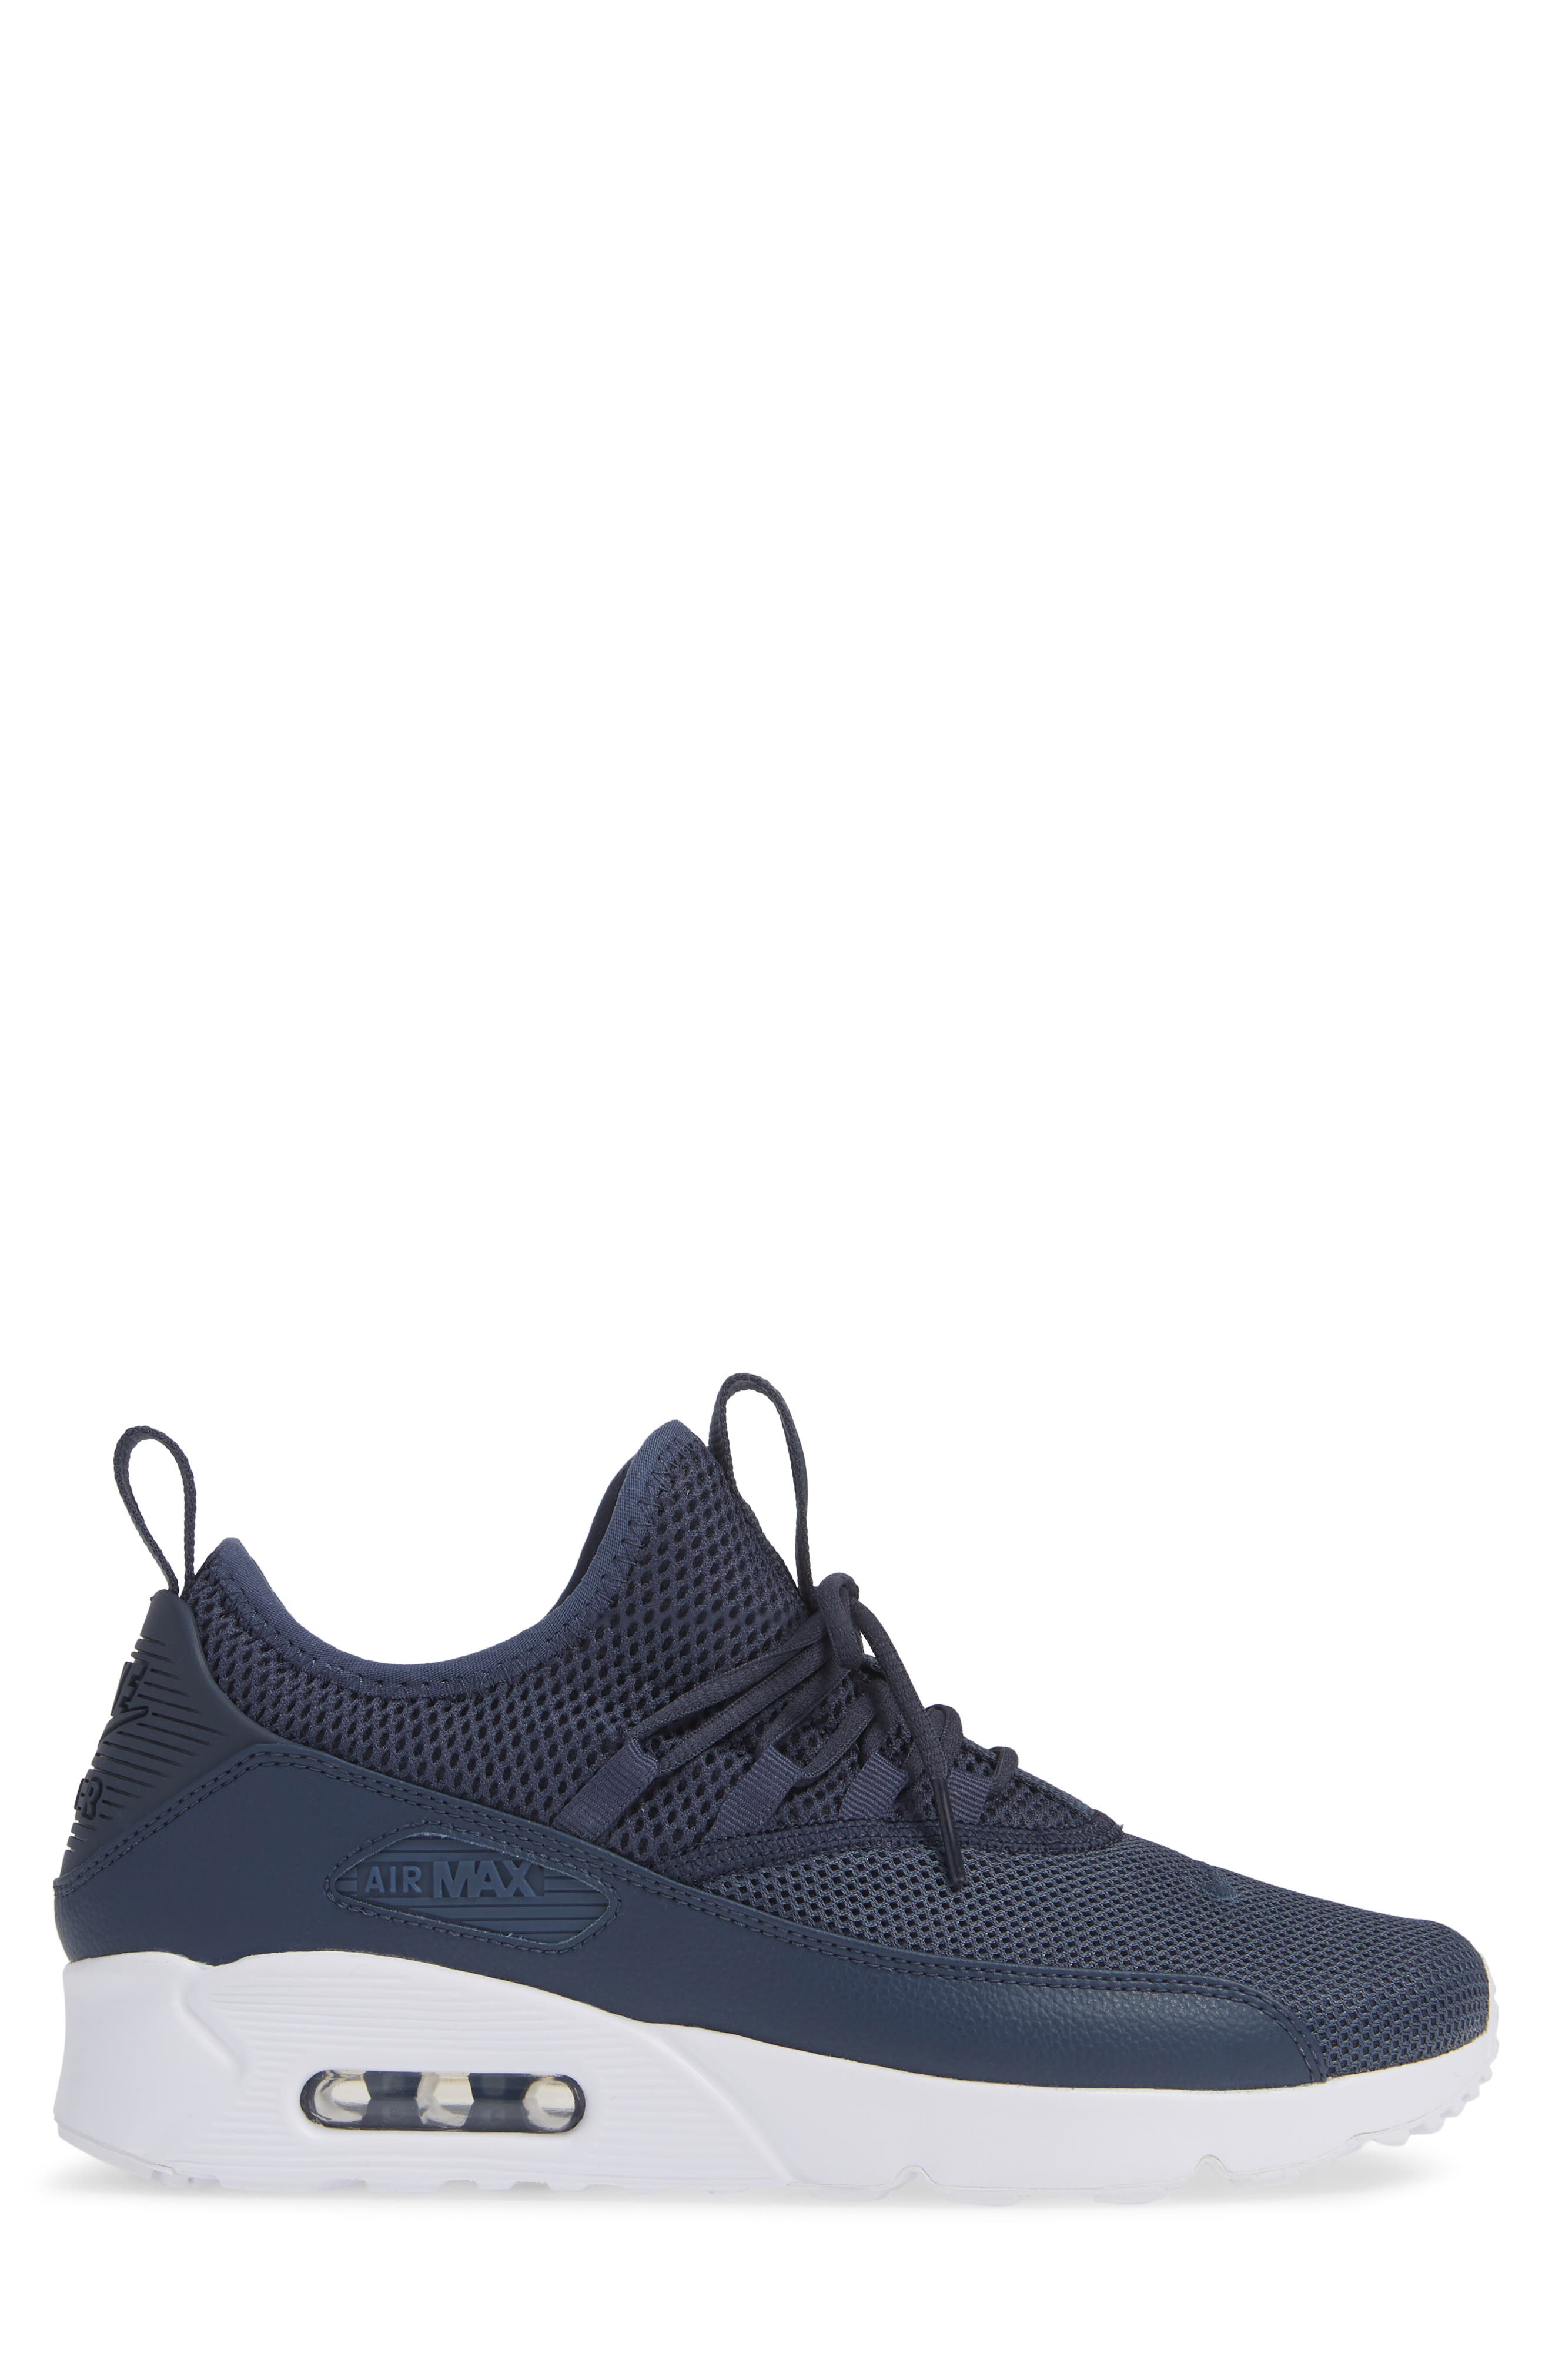 Air Max 90 EZ Sneaker,                             Alternate thumbnail 3, color,                             THUNDER BLUE/ WHITE